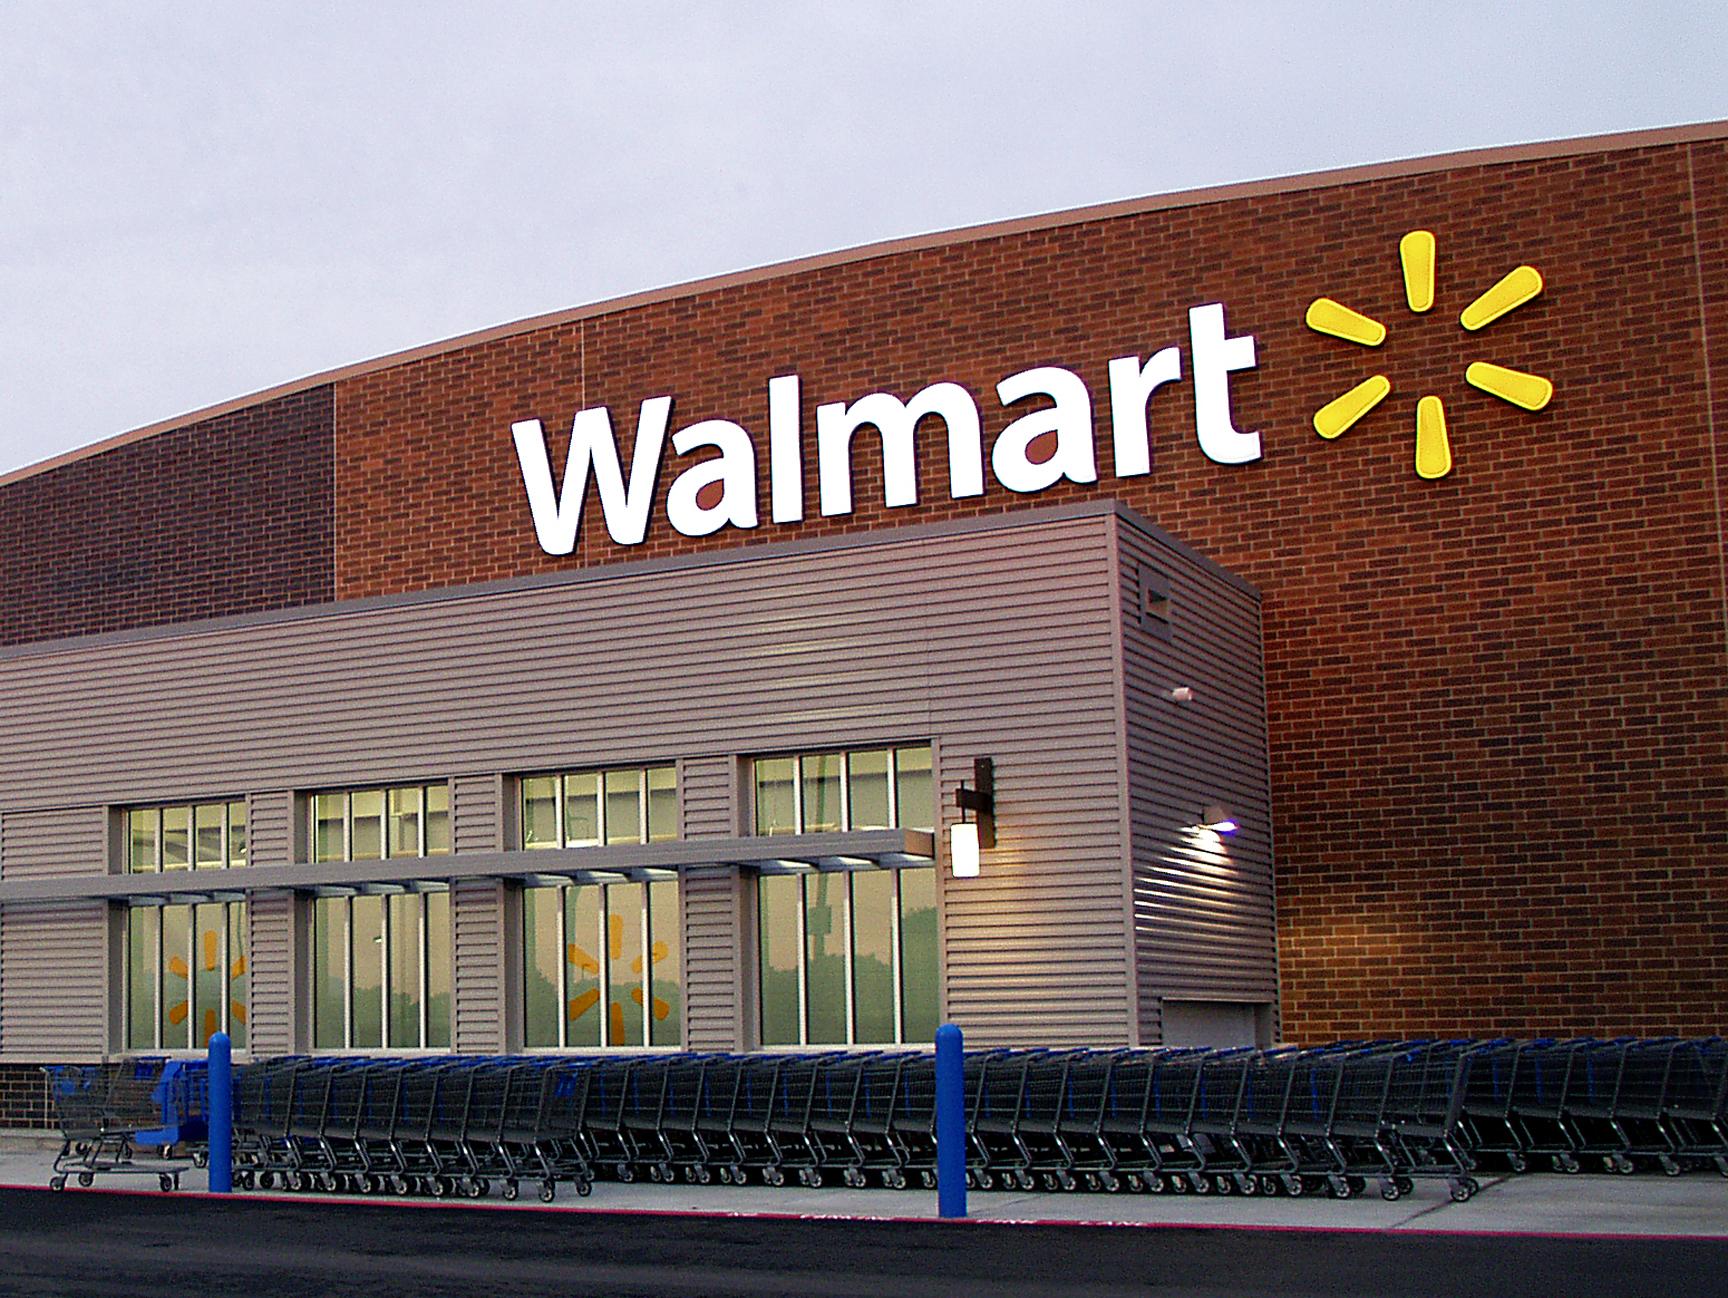 WalmartOne Login – Employee Associate Login at walmartone.com